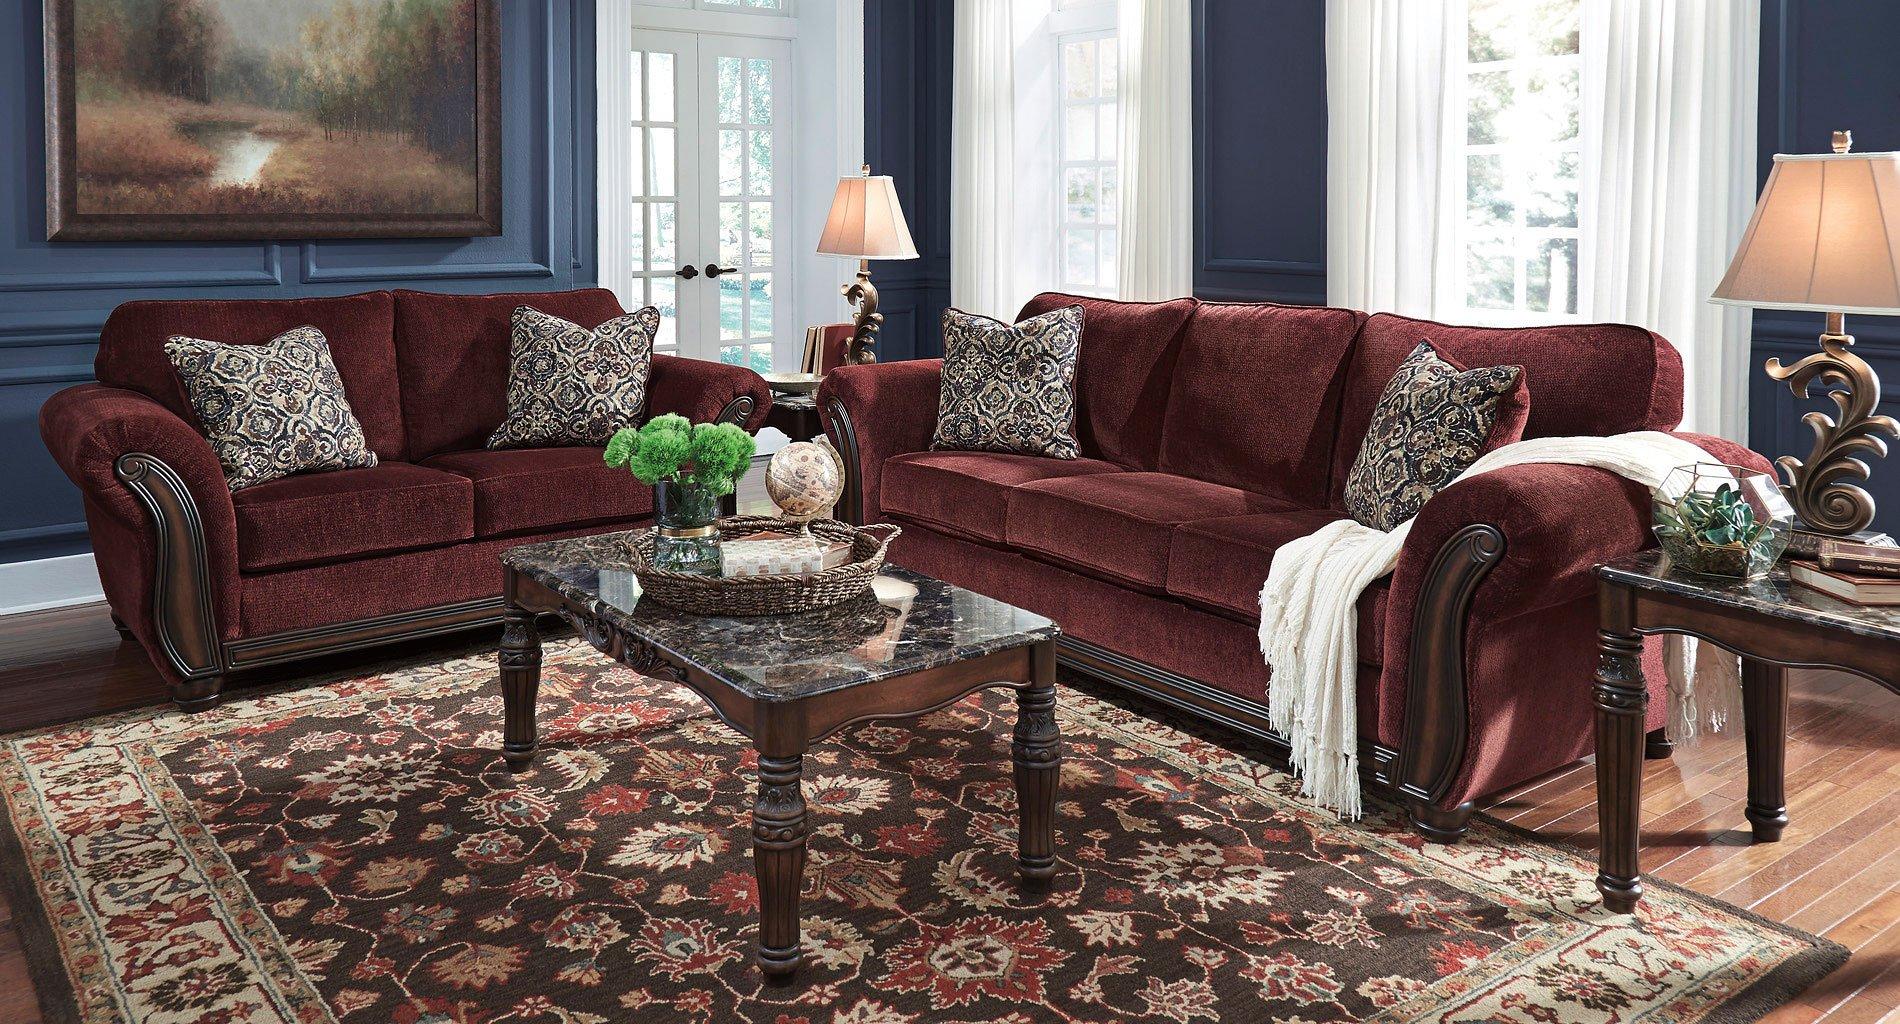 Chesterbrook Burgundy Living Room Set